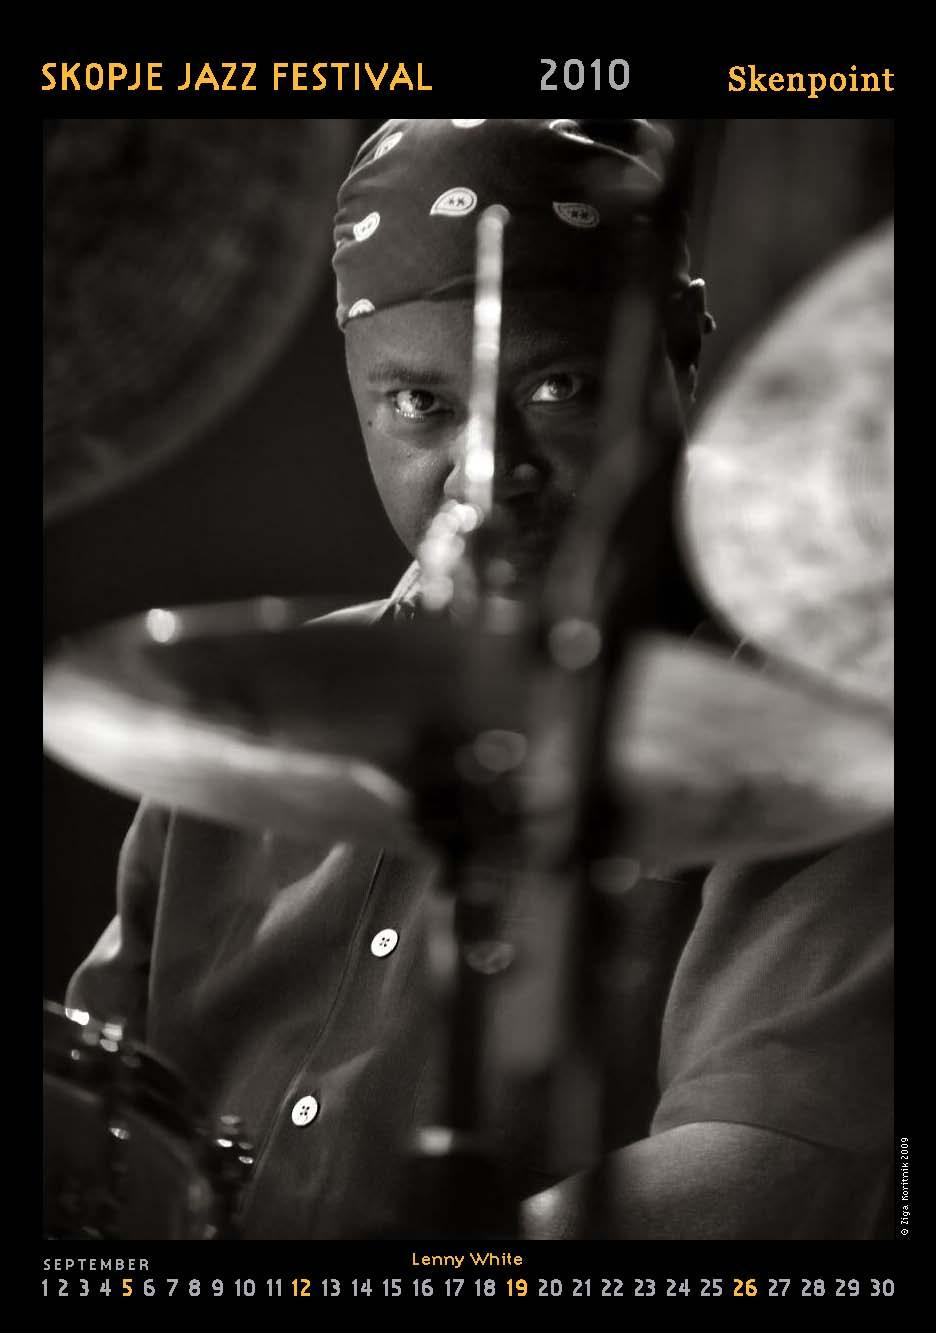 Lenny White / Skopje Jazz Festival 2010 Calendar / Photo by:Ziga Koritnik